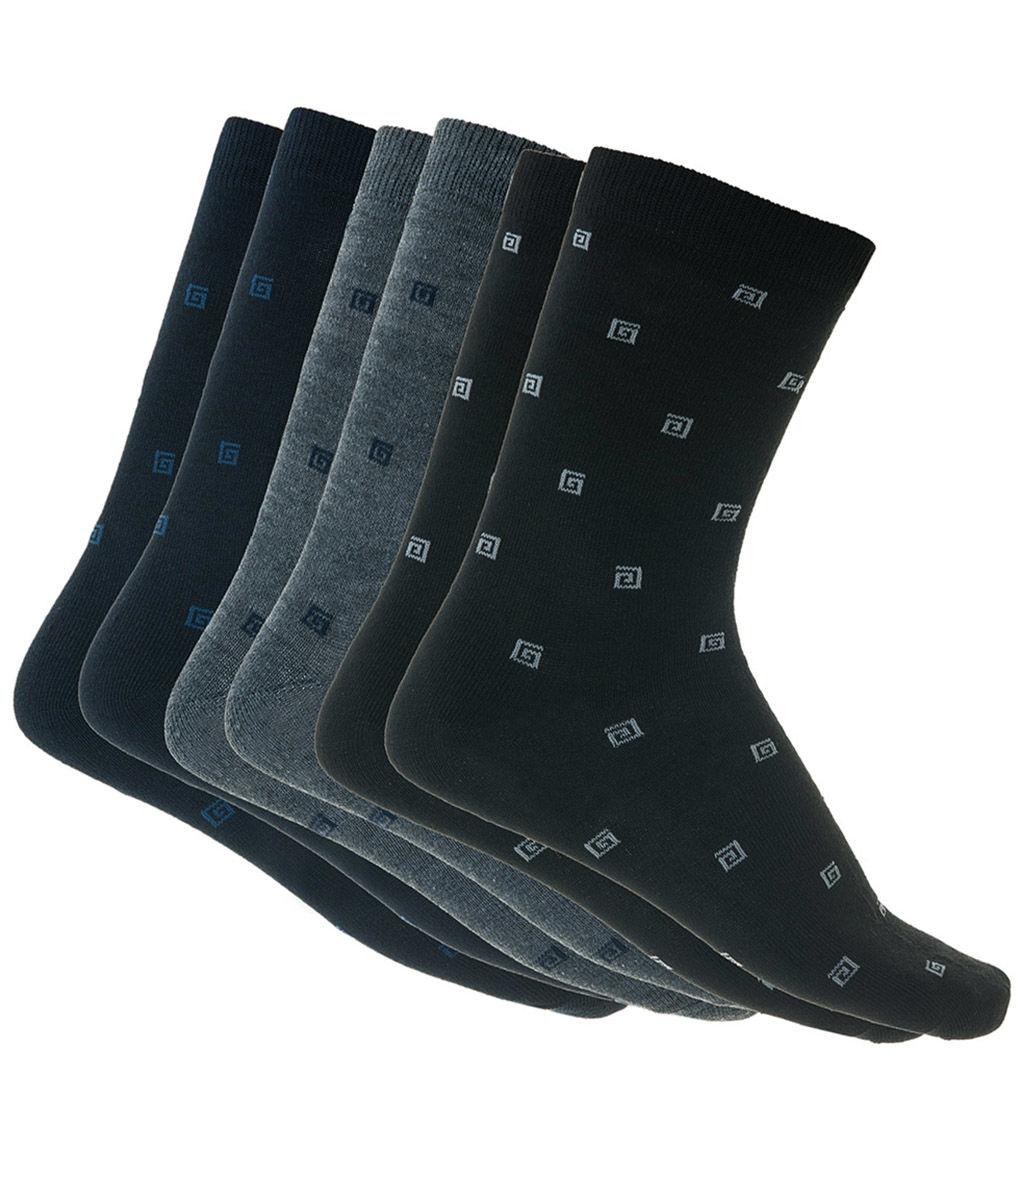 e19ba9de4051 Ανδρικές κάλτσες βαμβακερές με σχέδιο Μαύρο-Μπλε-Ανθρακί 3 ζεύγη